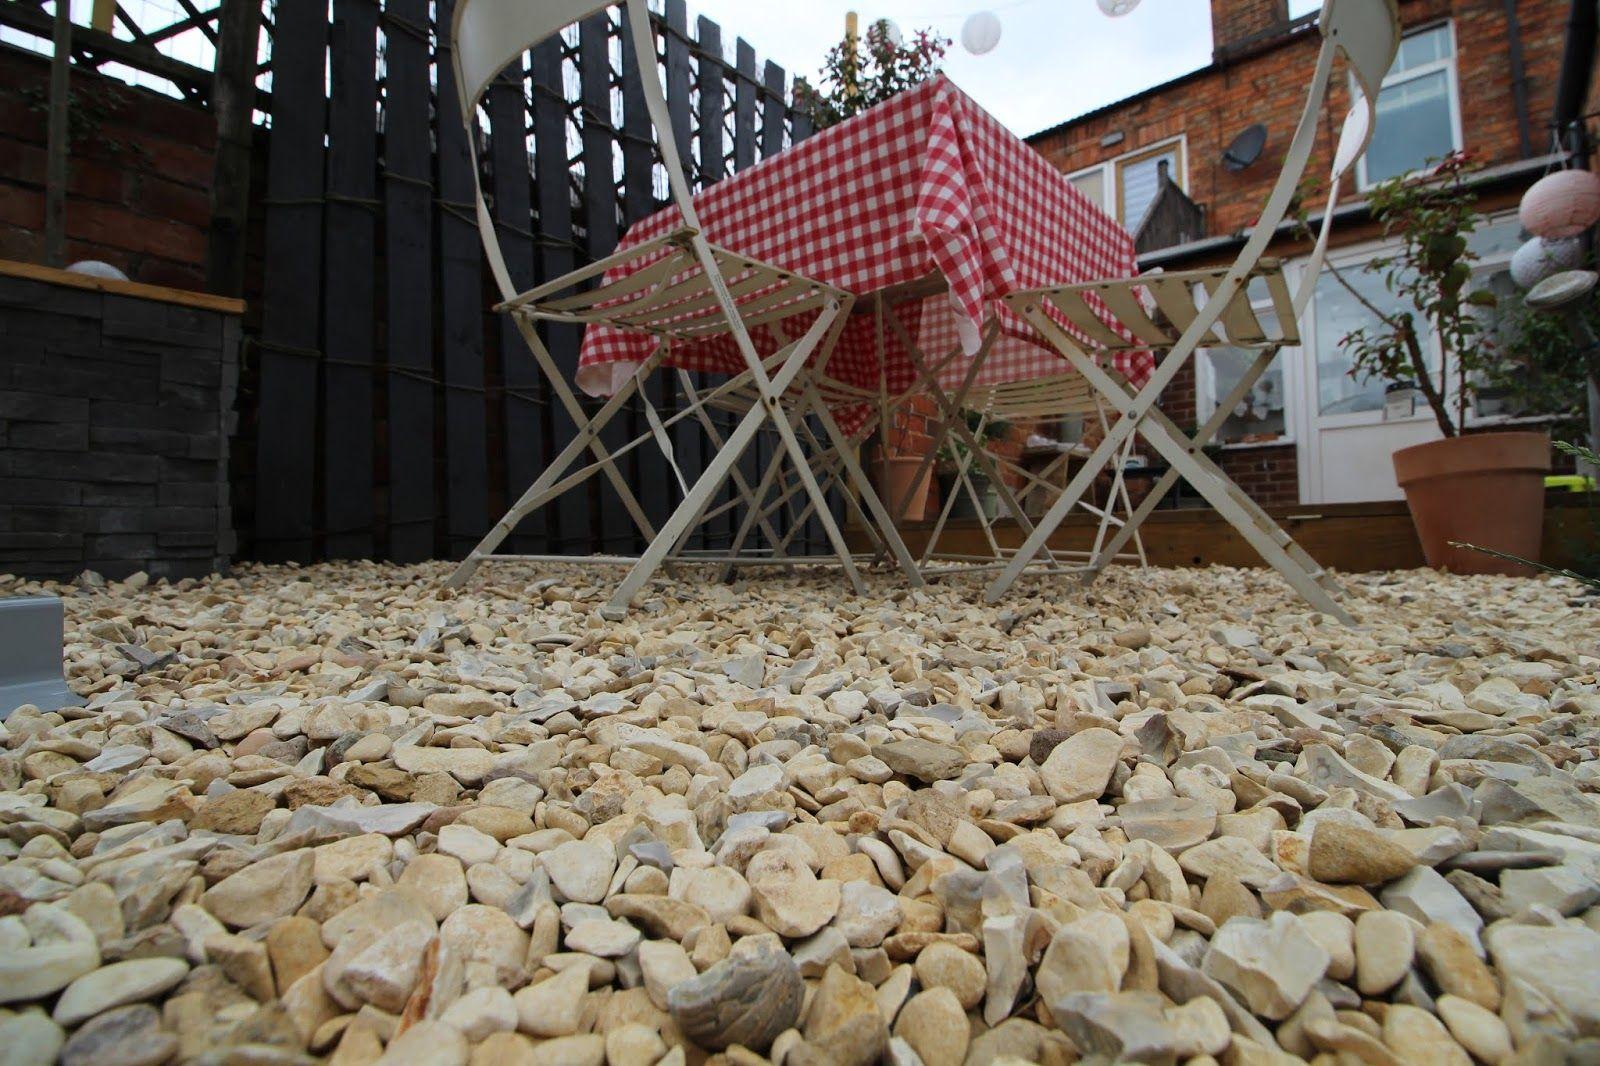 Laying Gravel In the Garden | Gravel patio, Gravel garden ...